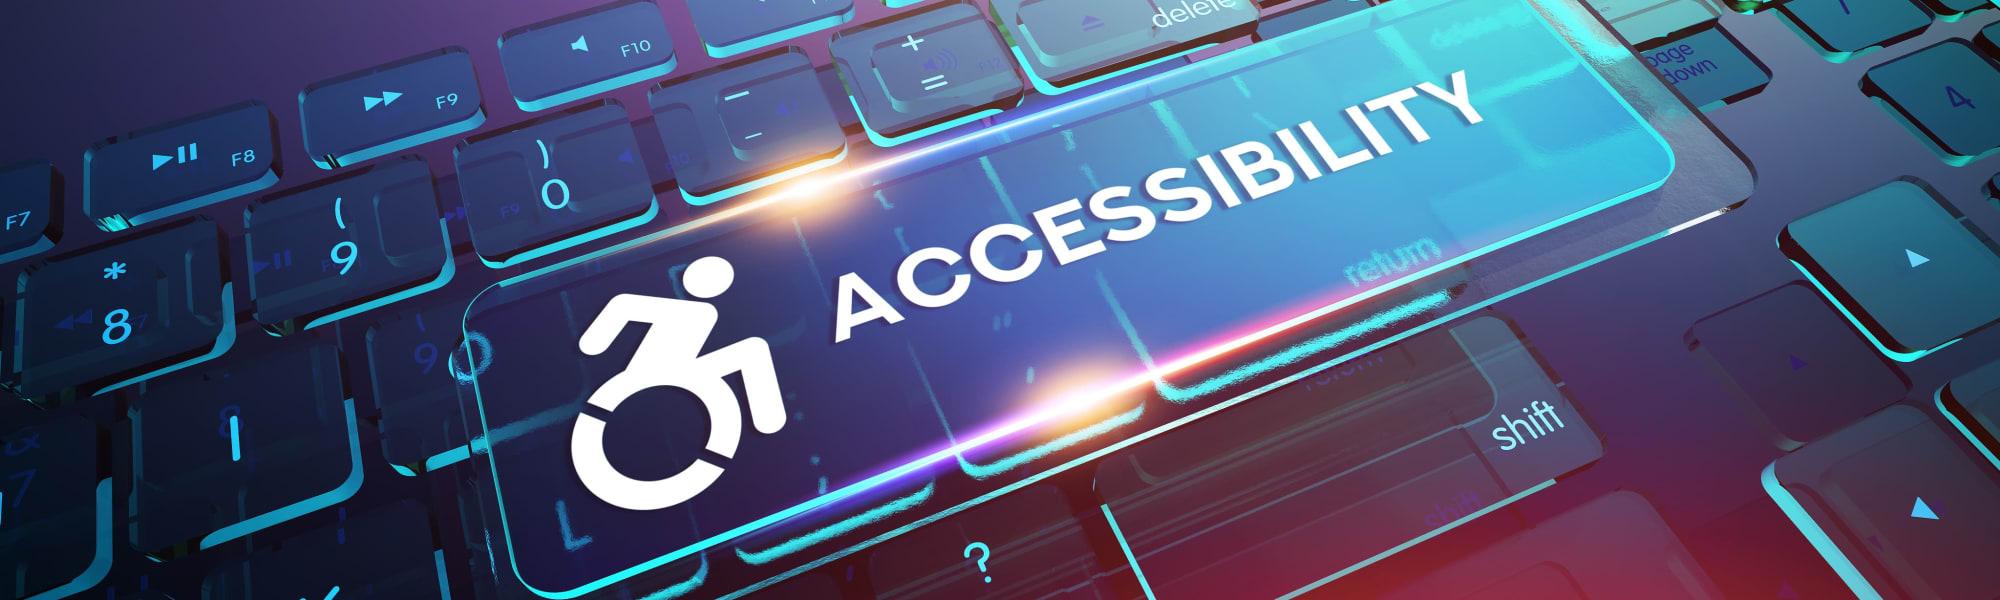 Accessibility policy for Carrington Oaks in Buda, Texas